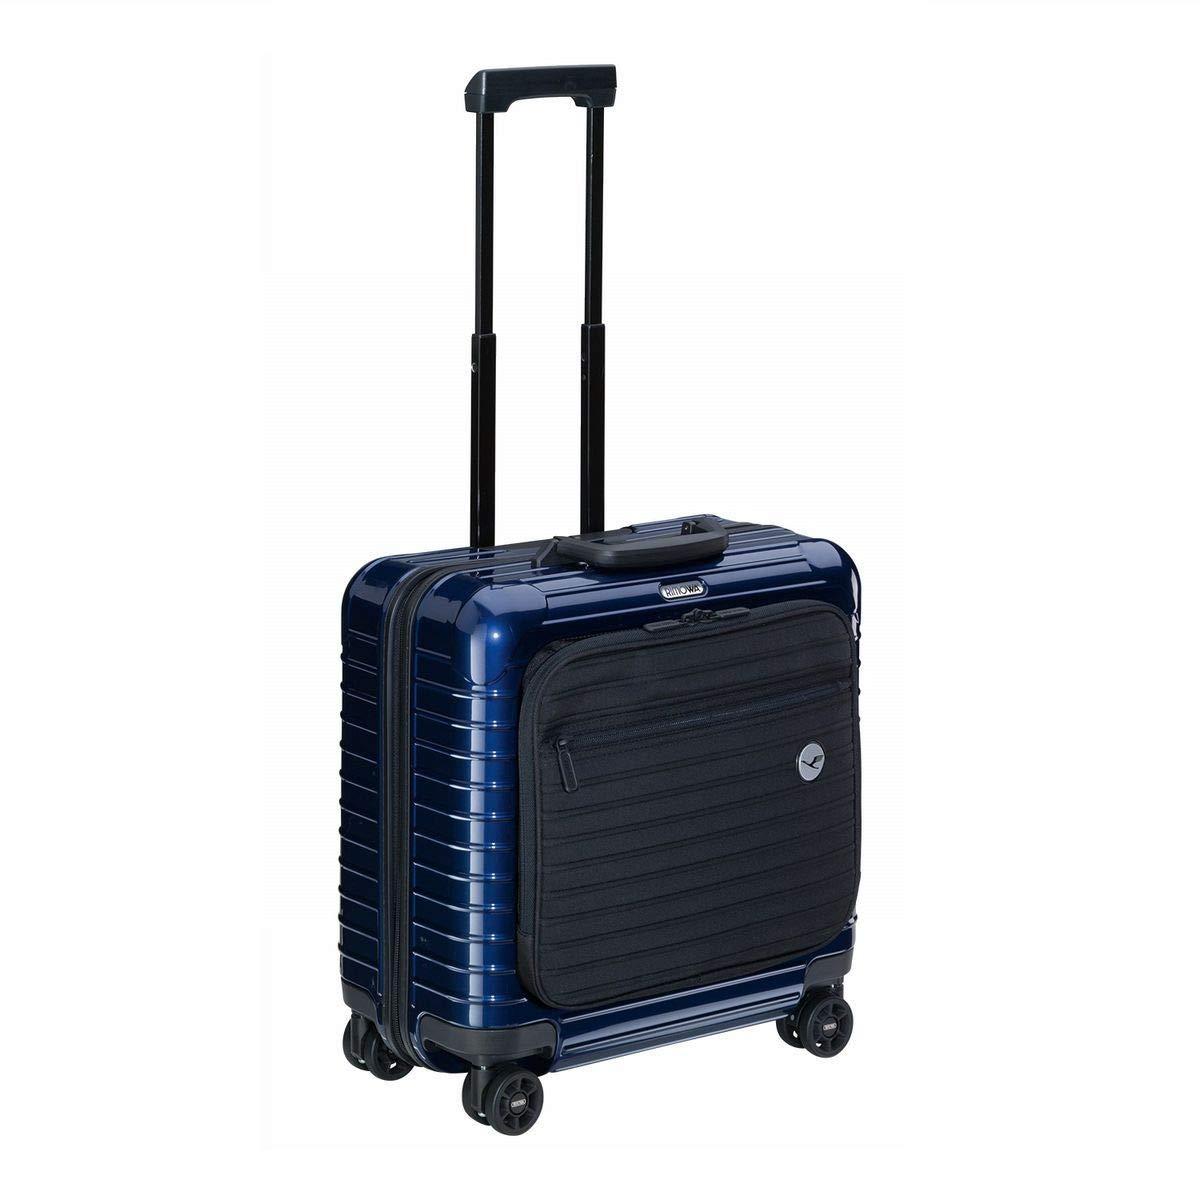 【RIMOWA×Lufthansa】(リモワ×ルフトハンザ航空) Bolero ボレロ ビジネストローリー 23L ブルー [並行輸入品] B07PFWYDRJ